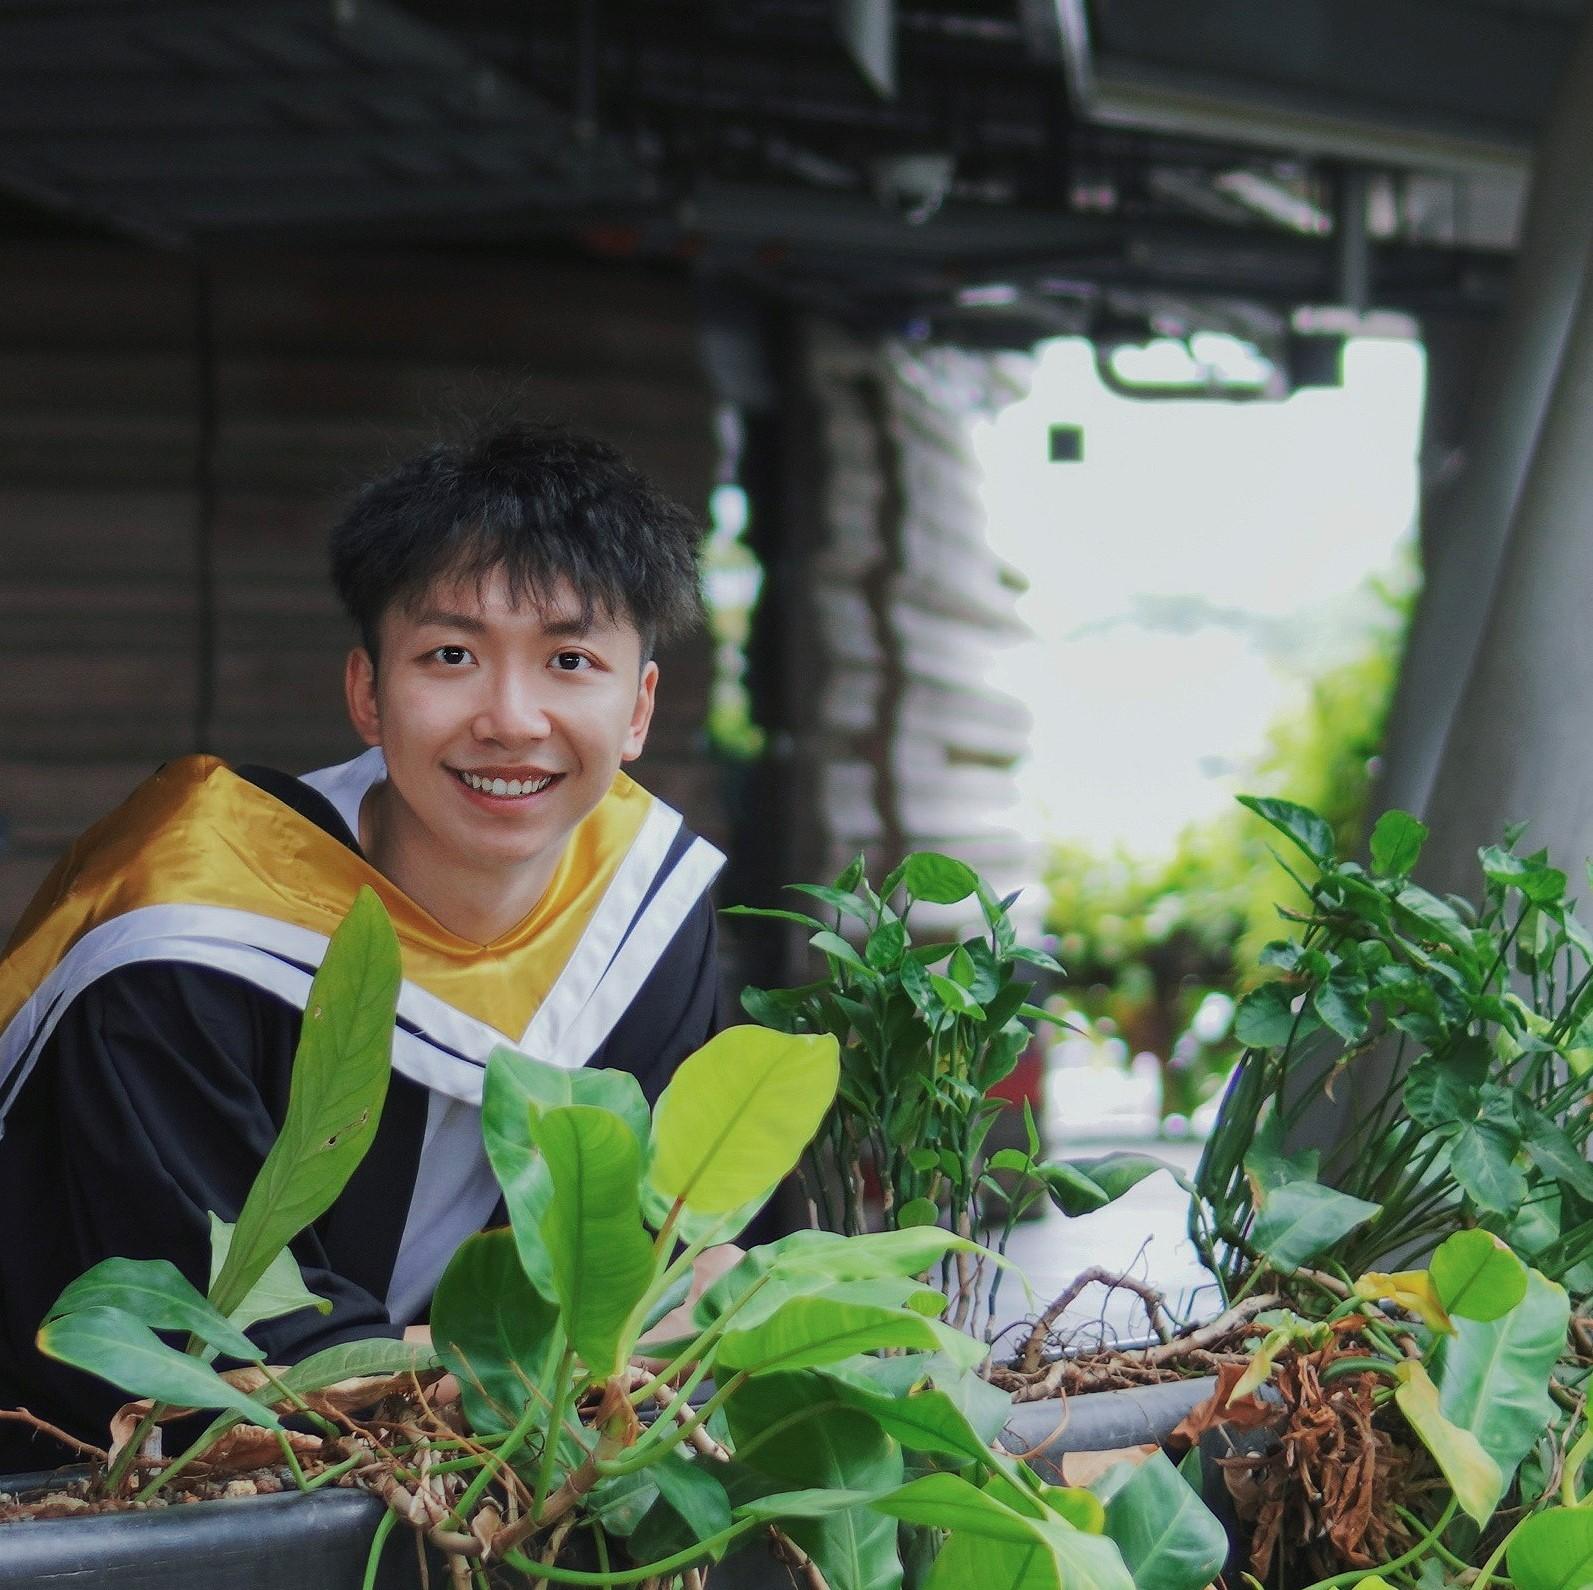 Fuzhao Xue